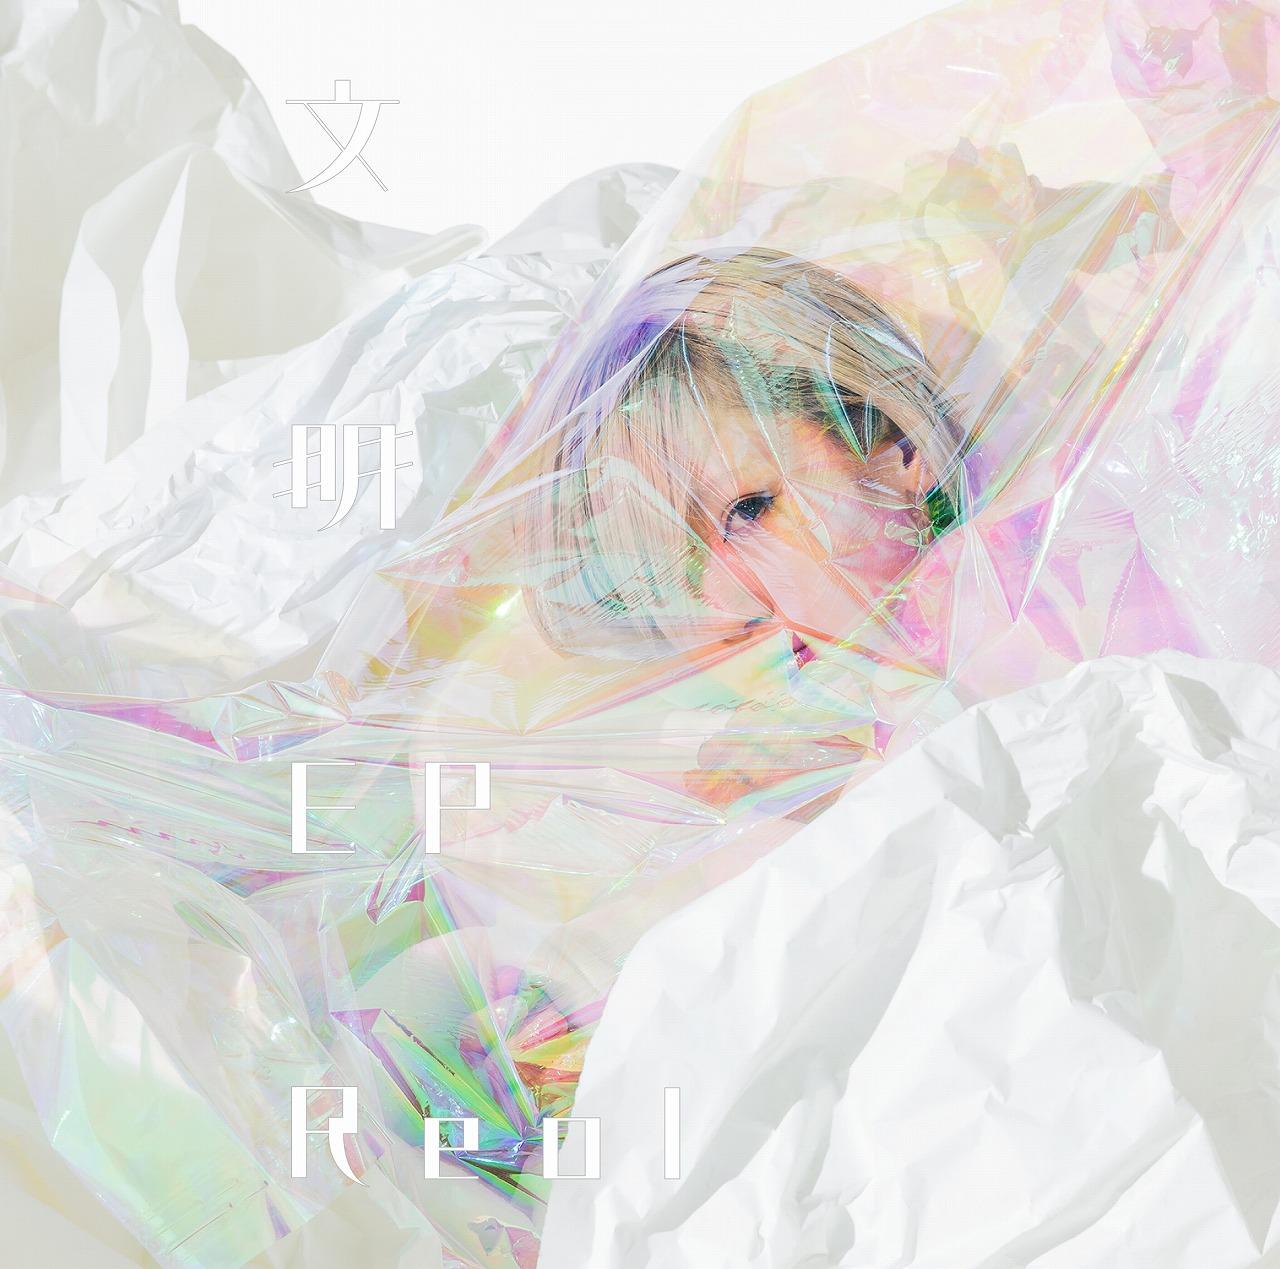 Reol、10月に東名阪ワンマンツアー「Reol Oneman Live 2019」開催決定サムネイル画像!